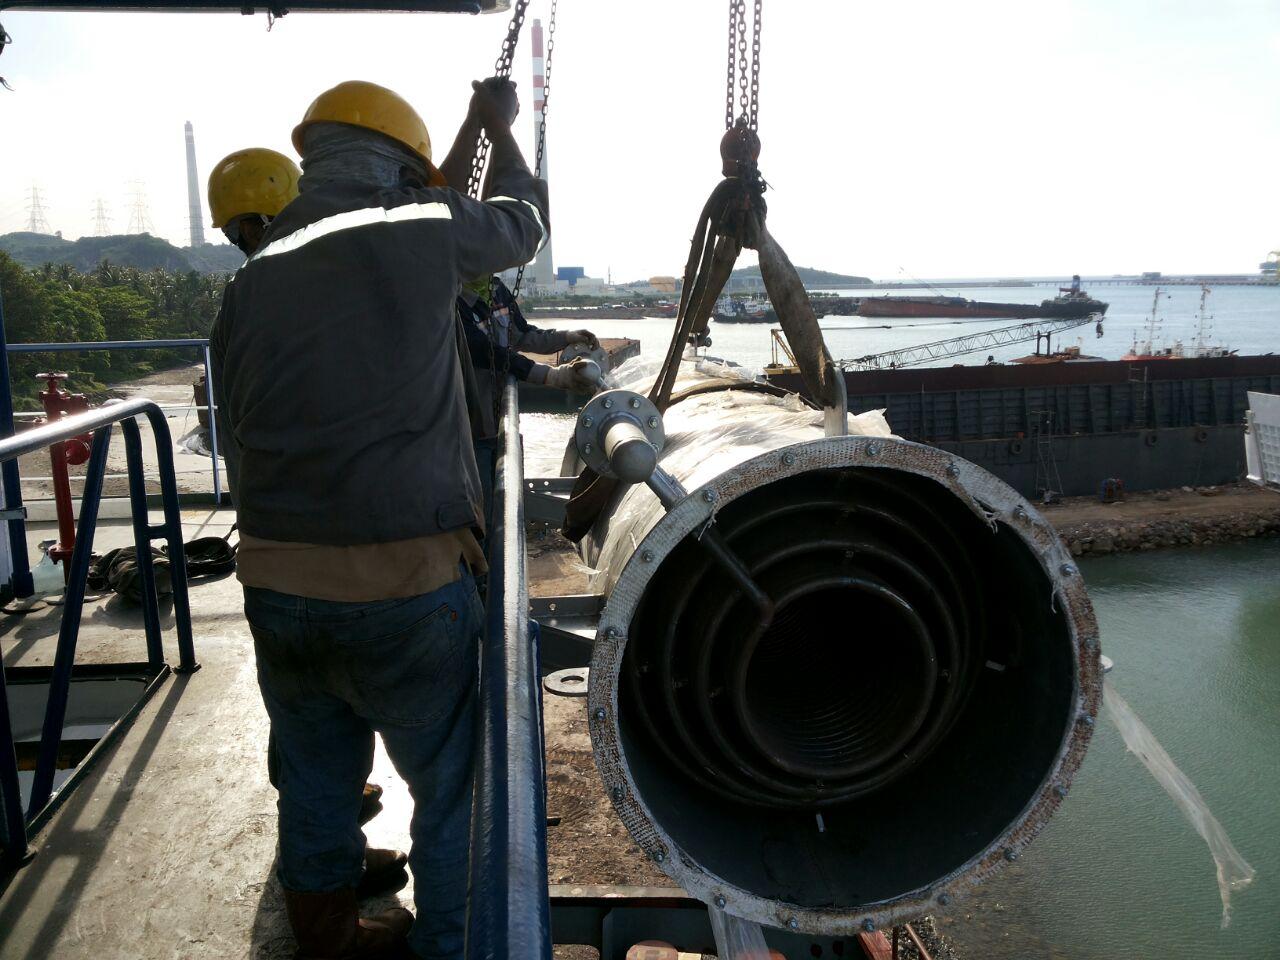 https://boilermarine.co.id/jual-economizer-boiler-kapal-tanker/